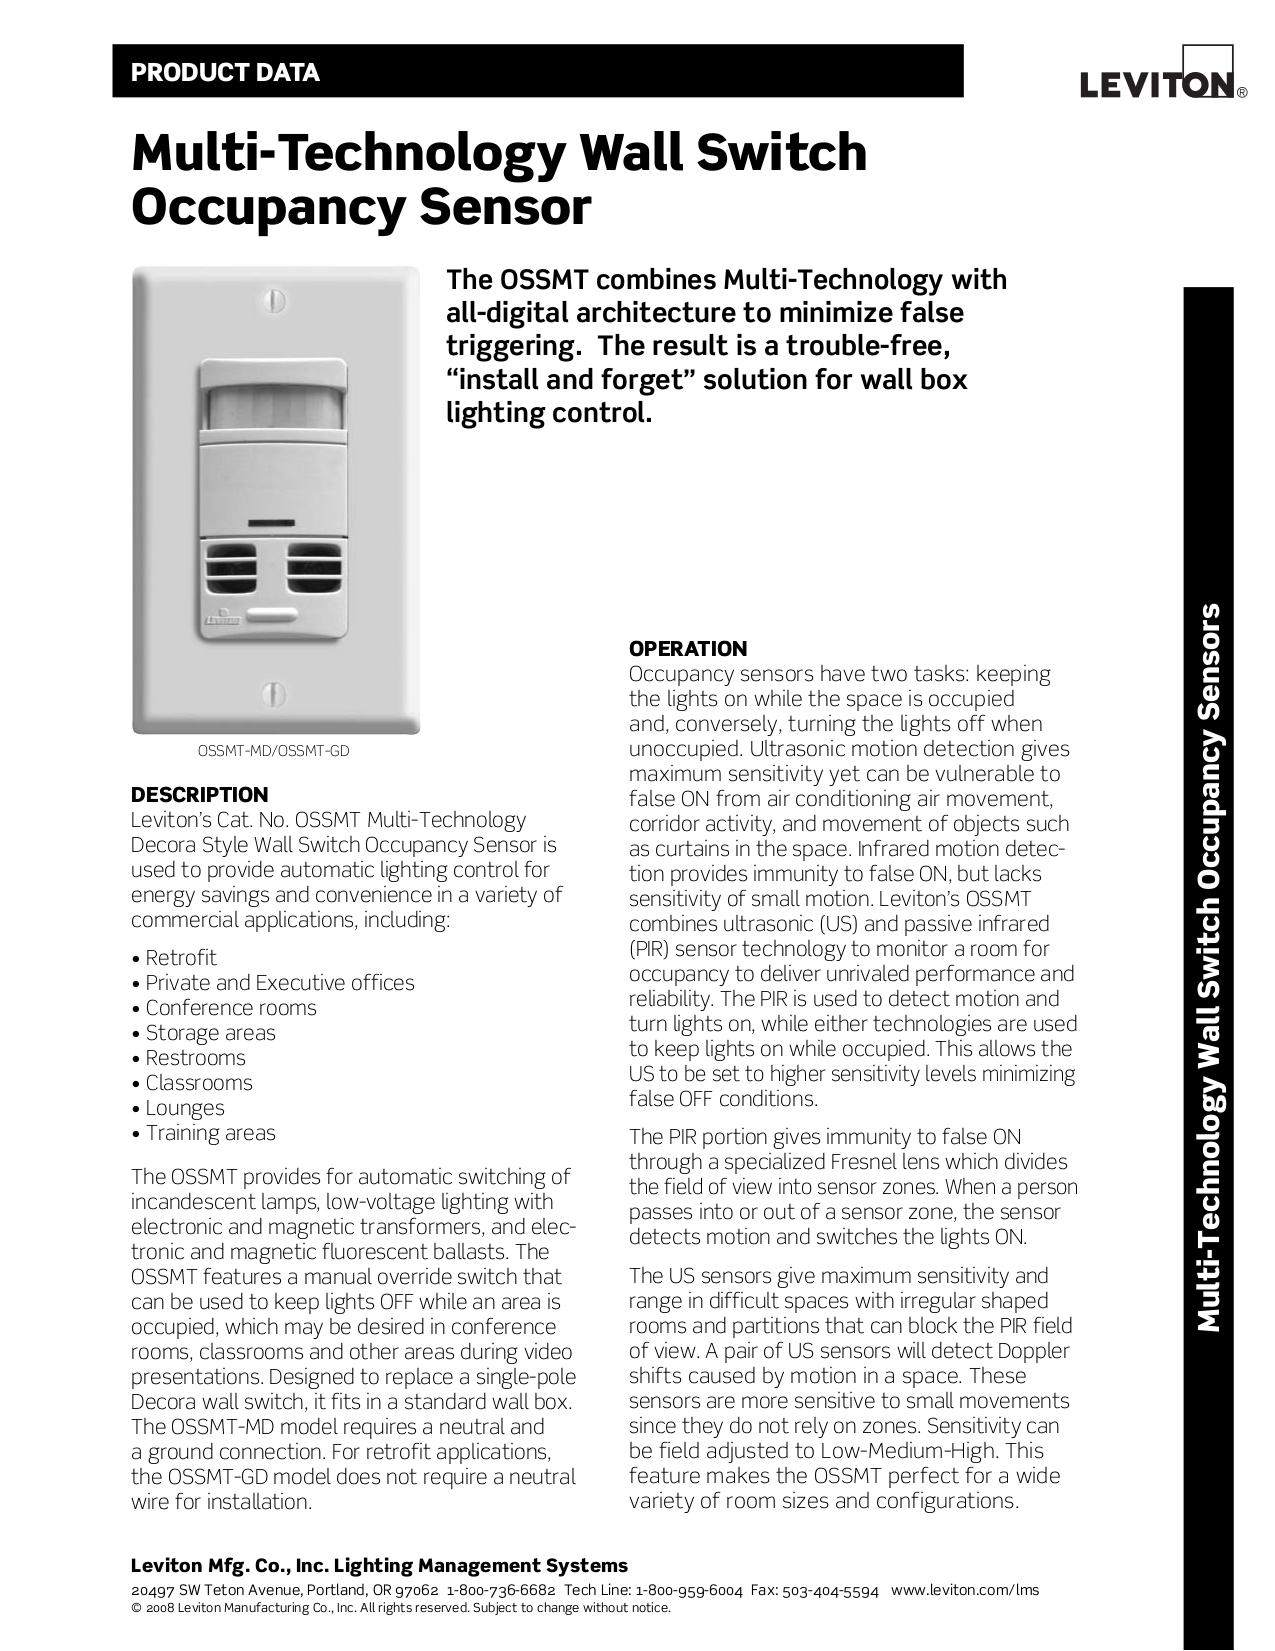 Download free pdf for Leviton OSSMT-GD Occupancy Sensor Other manual